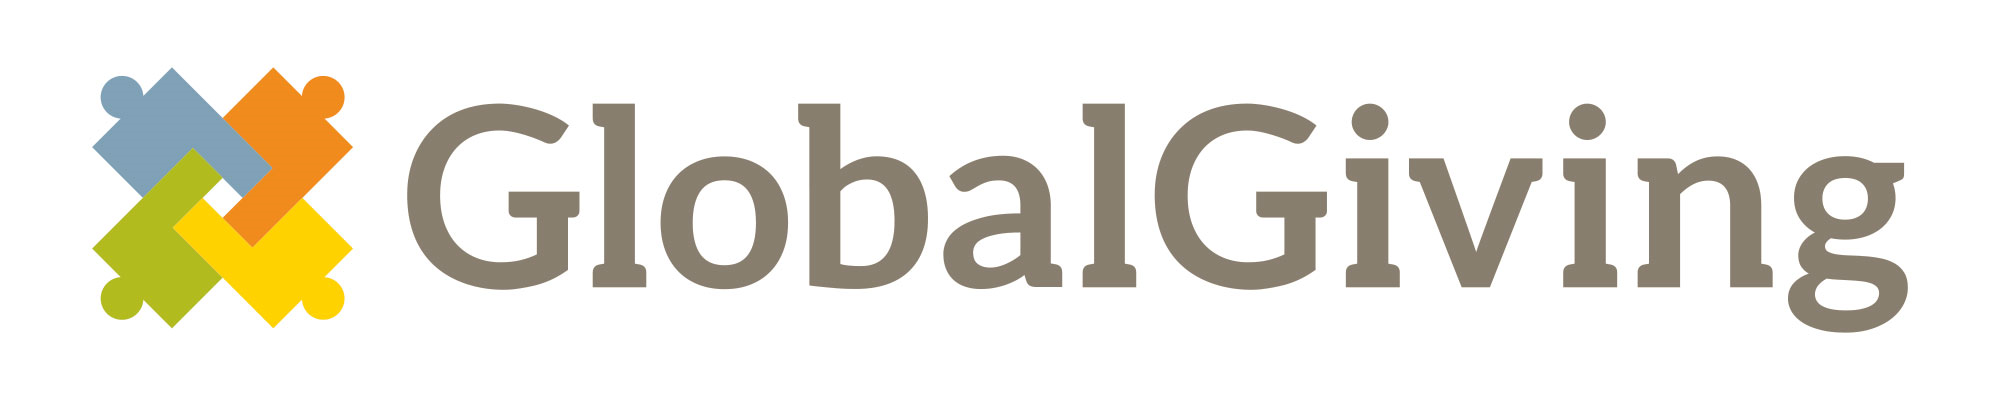 GlobalGiving Foundation Inc. logo